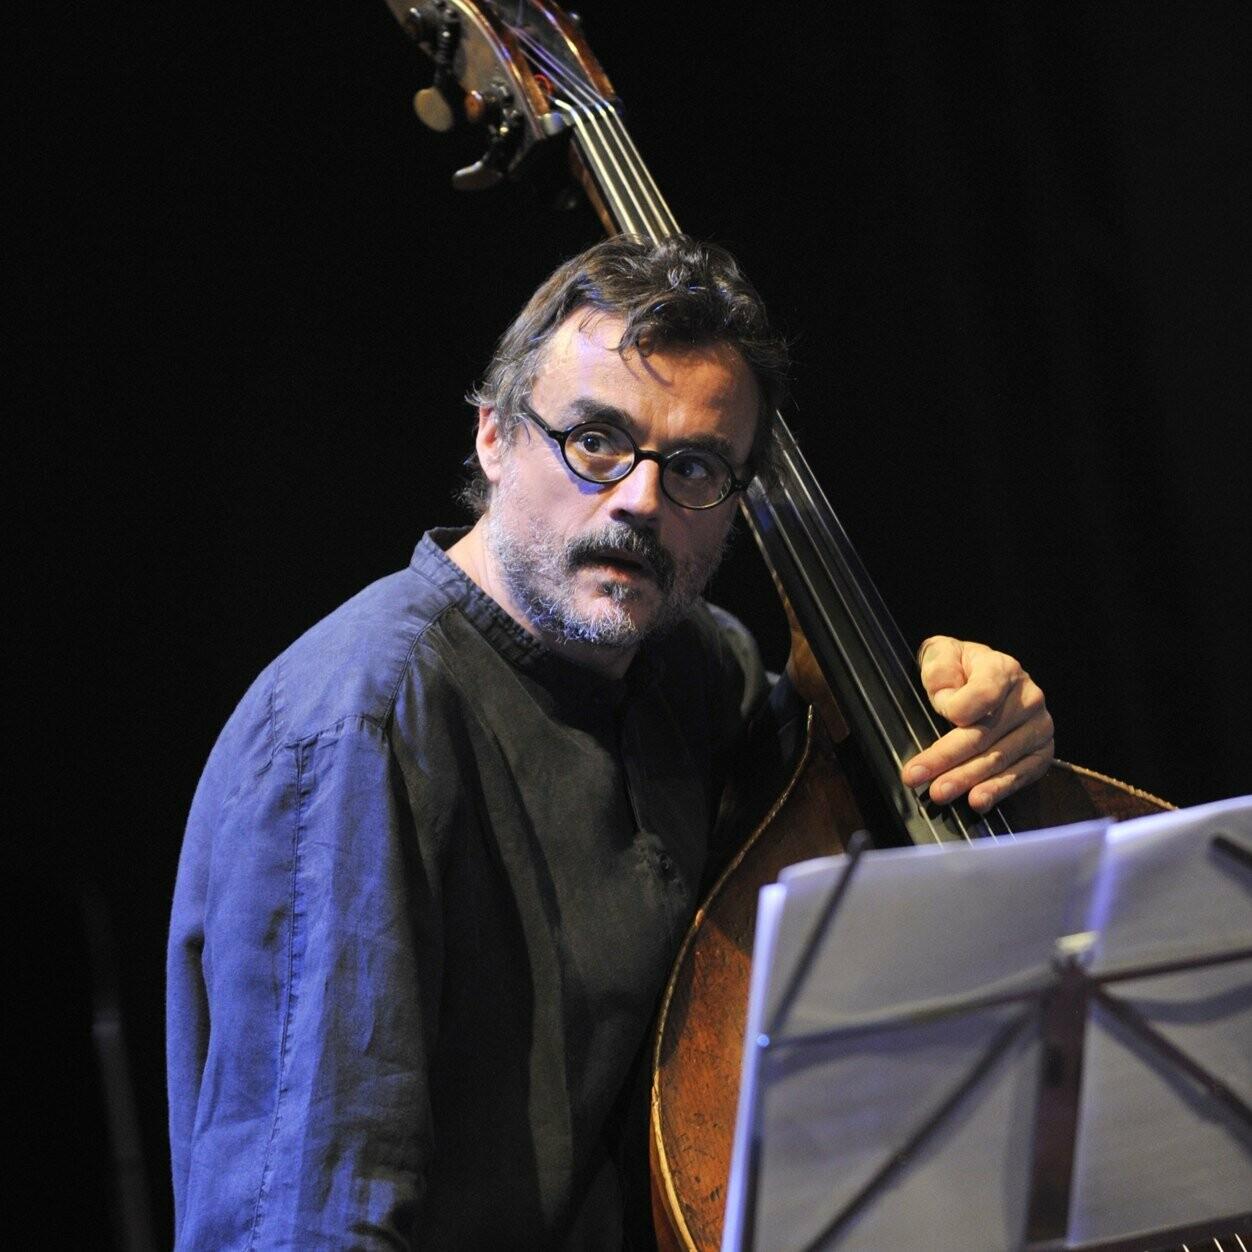 Al ParmaJazz Frontiere Festival Tor Yttredal e Roberto Bonati